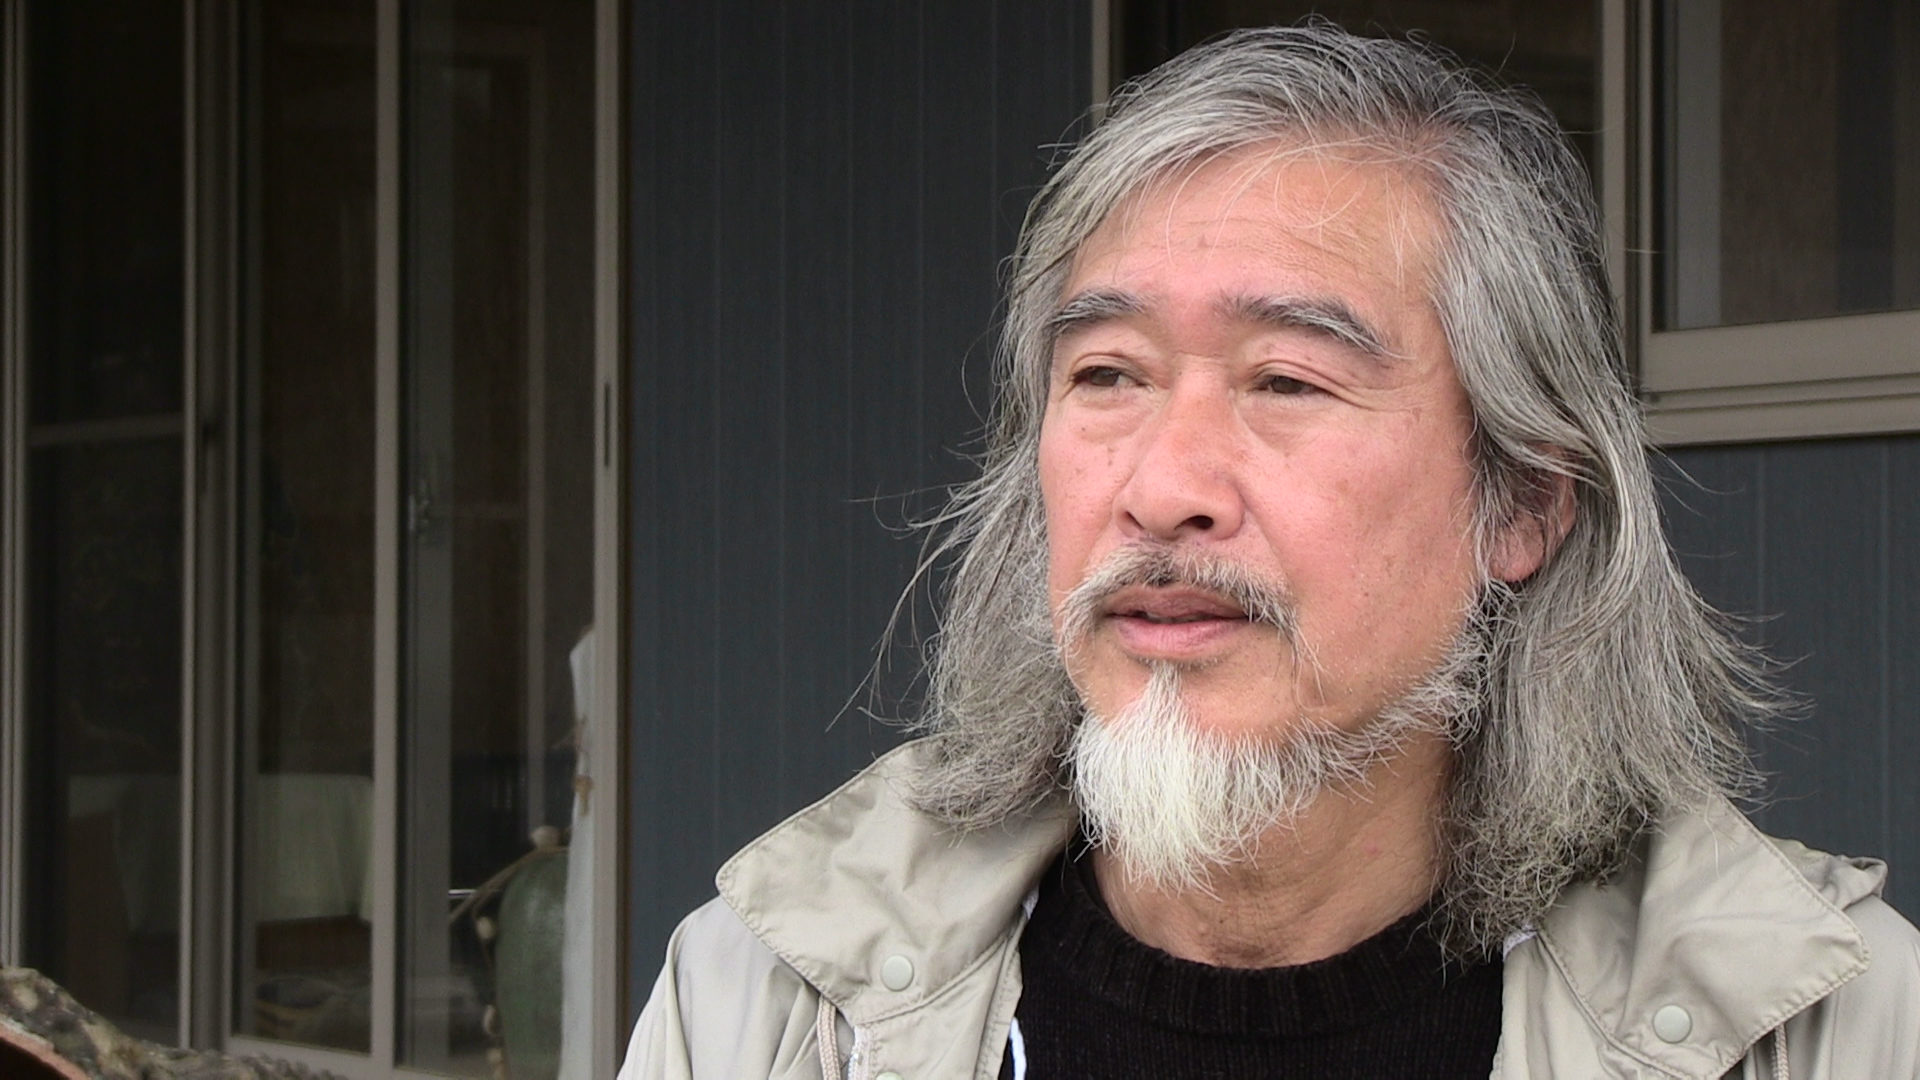 odaka kenji interview later with beard framegrab.JPG